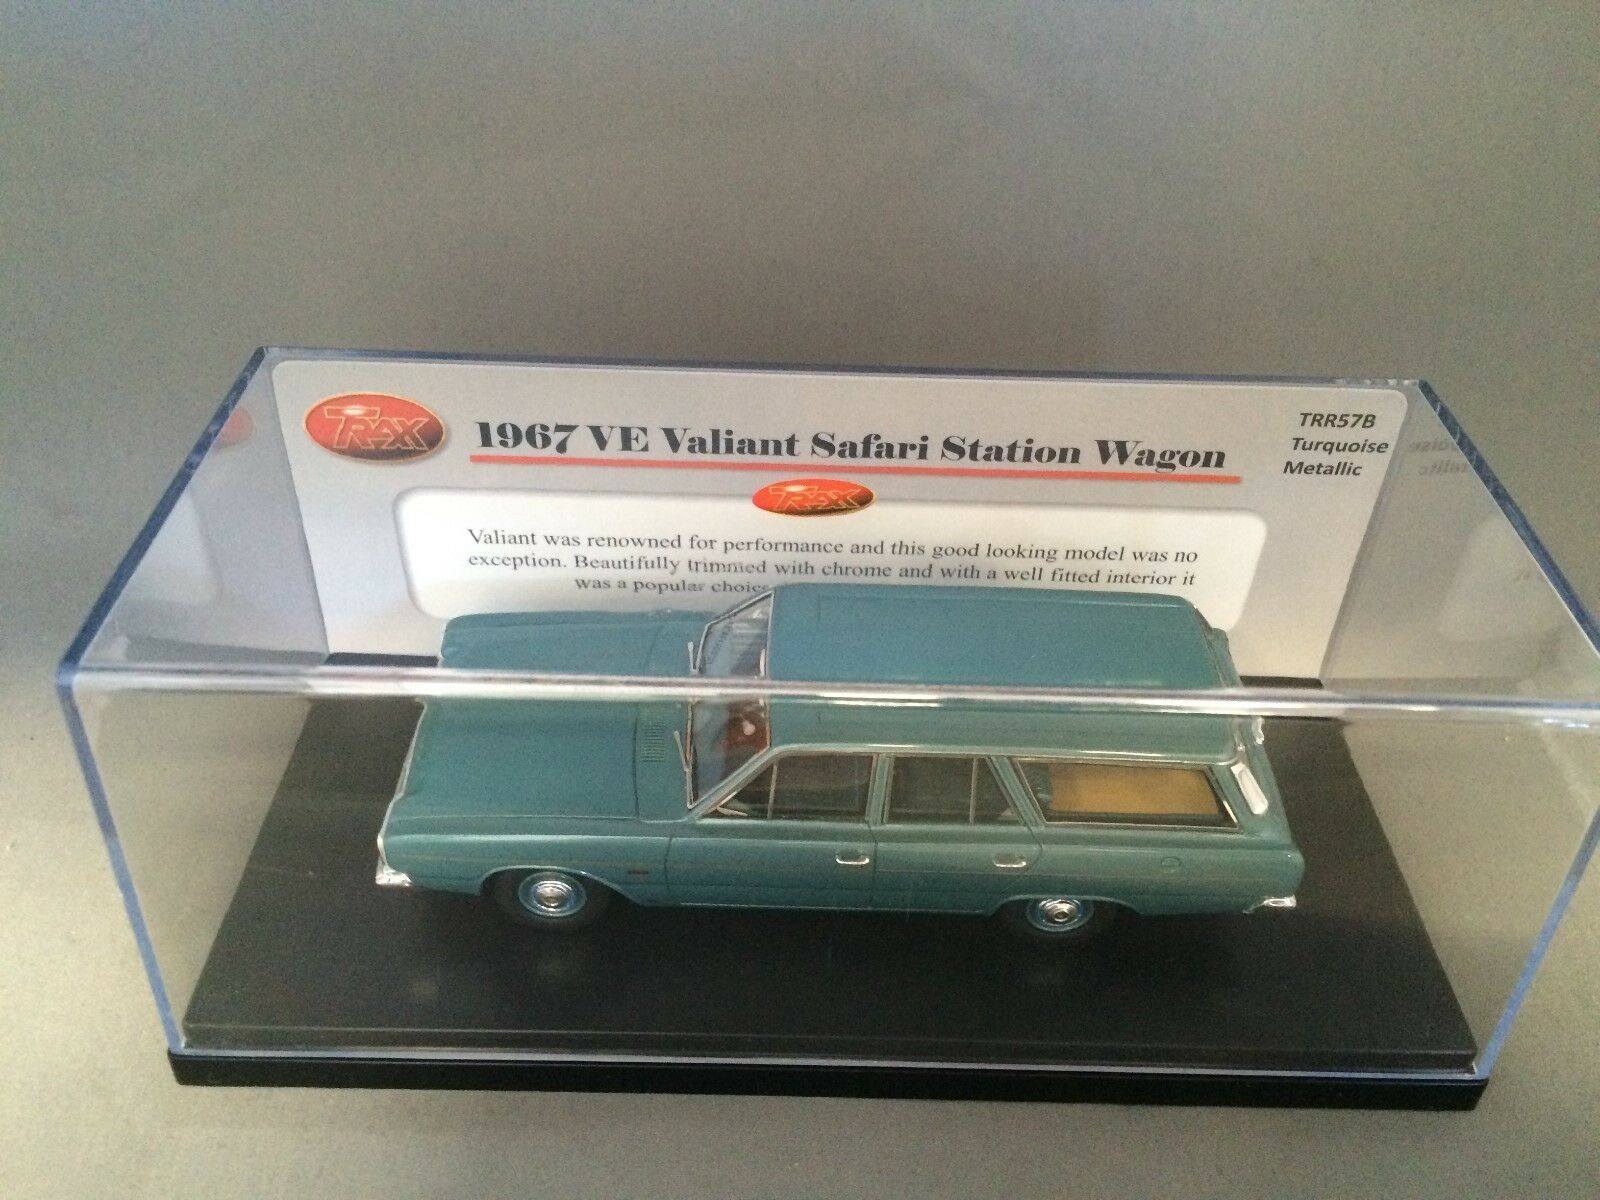 Trax TR57B 1967 VE Valiant Safari Station Wagon- Turquoise